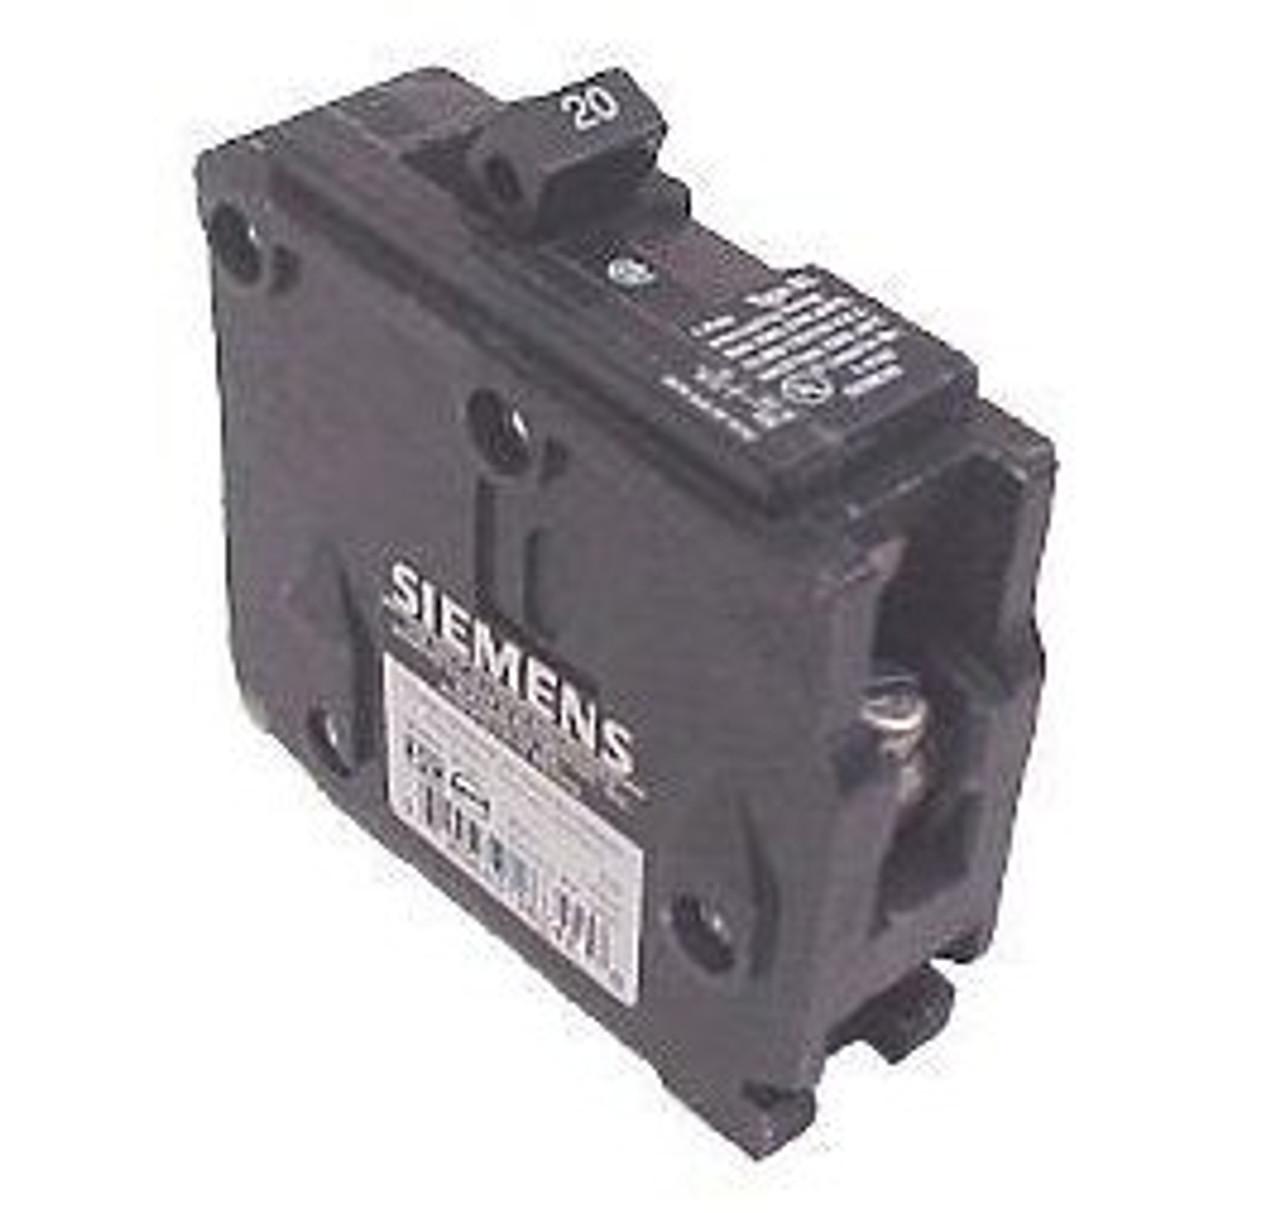 Siemens B12000S01 1 Pole 20A 120V 120V Shunt BL Circuit Breaker - Used